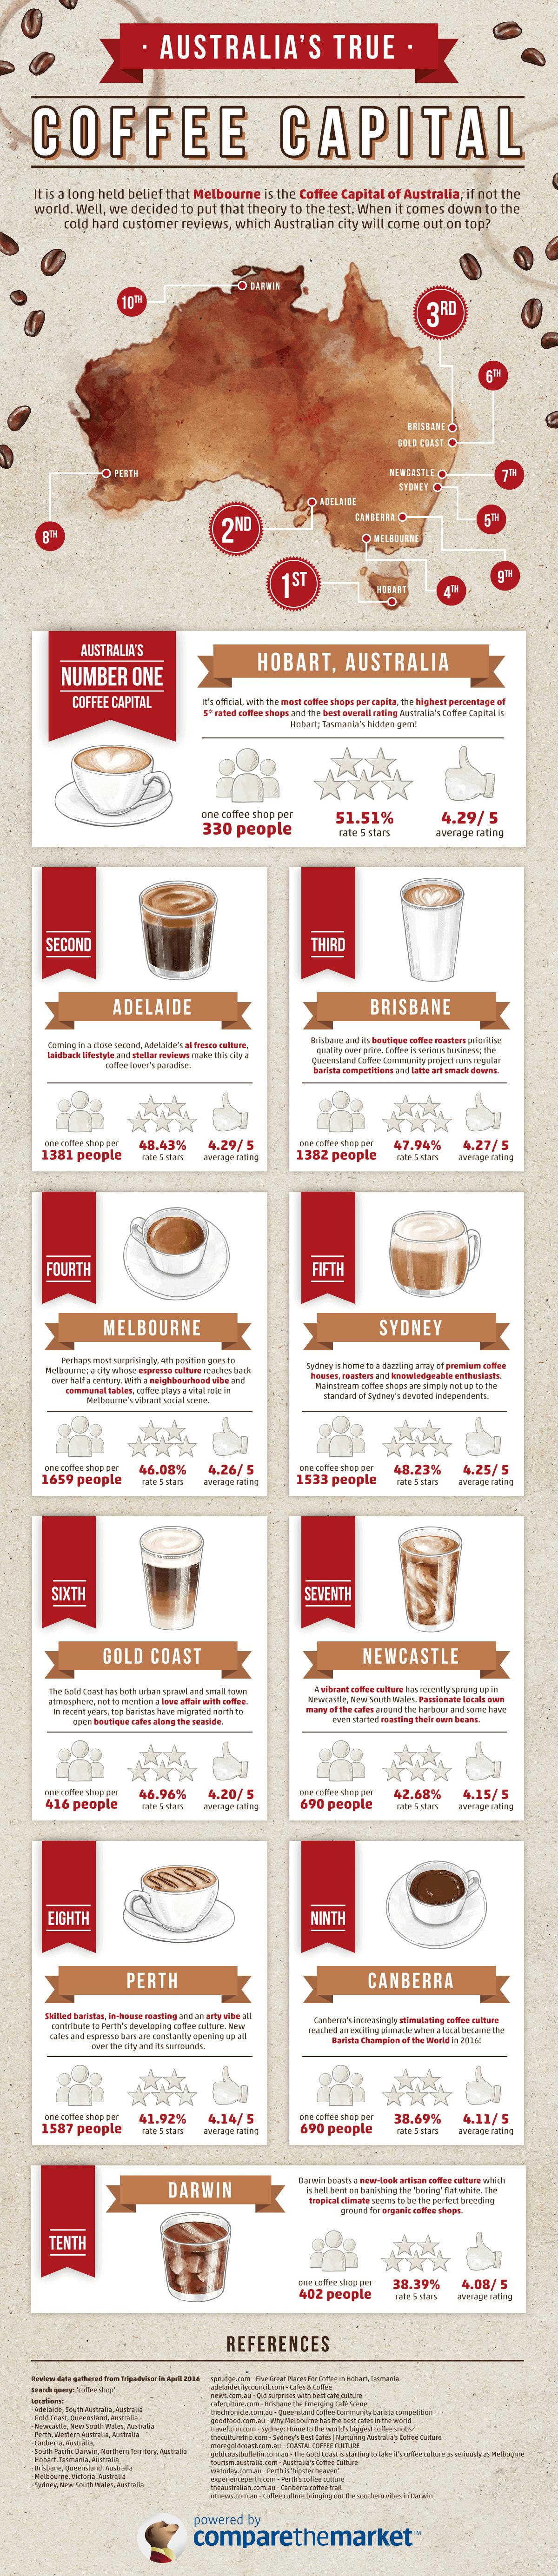 Australias coffee capital infographic